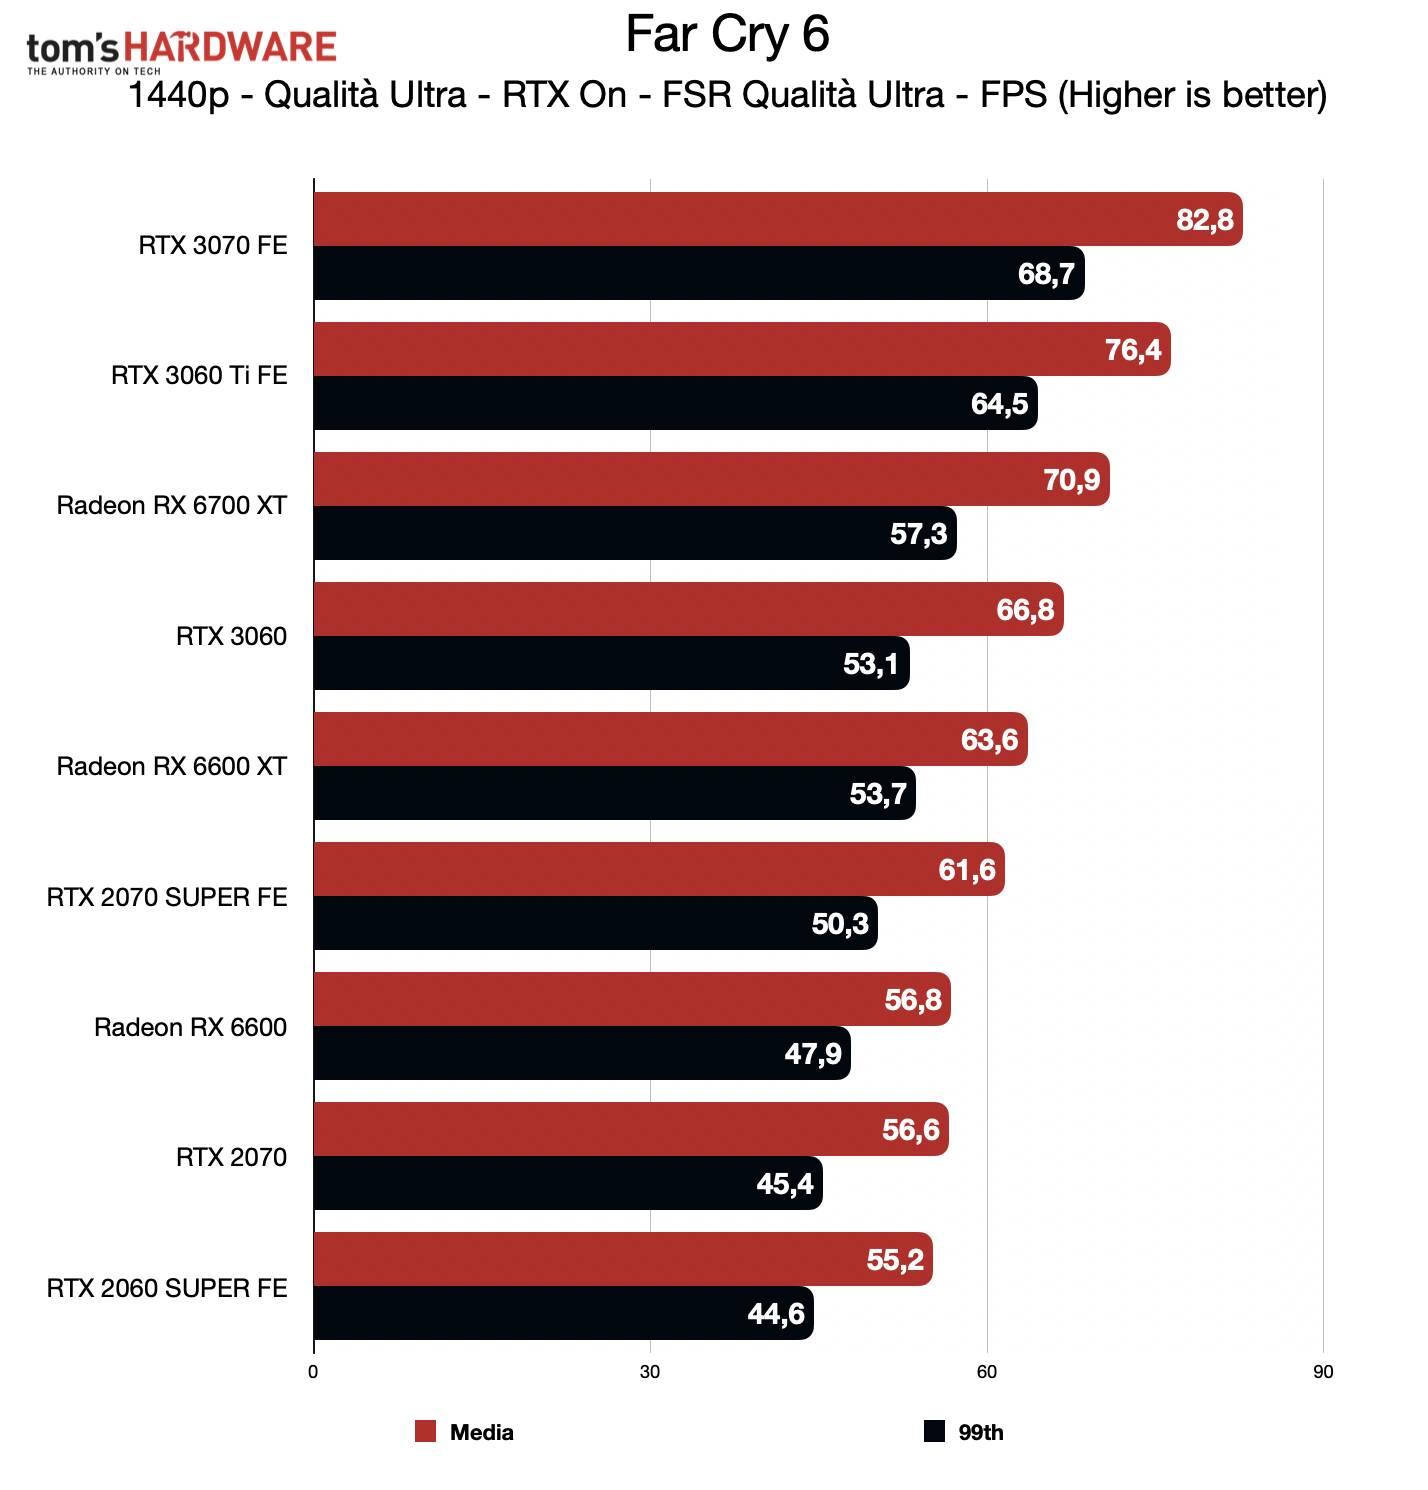 Benchmark Radeon RX 6600 - QHD RTX FSR - Far Cry 6